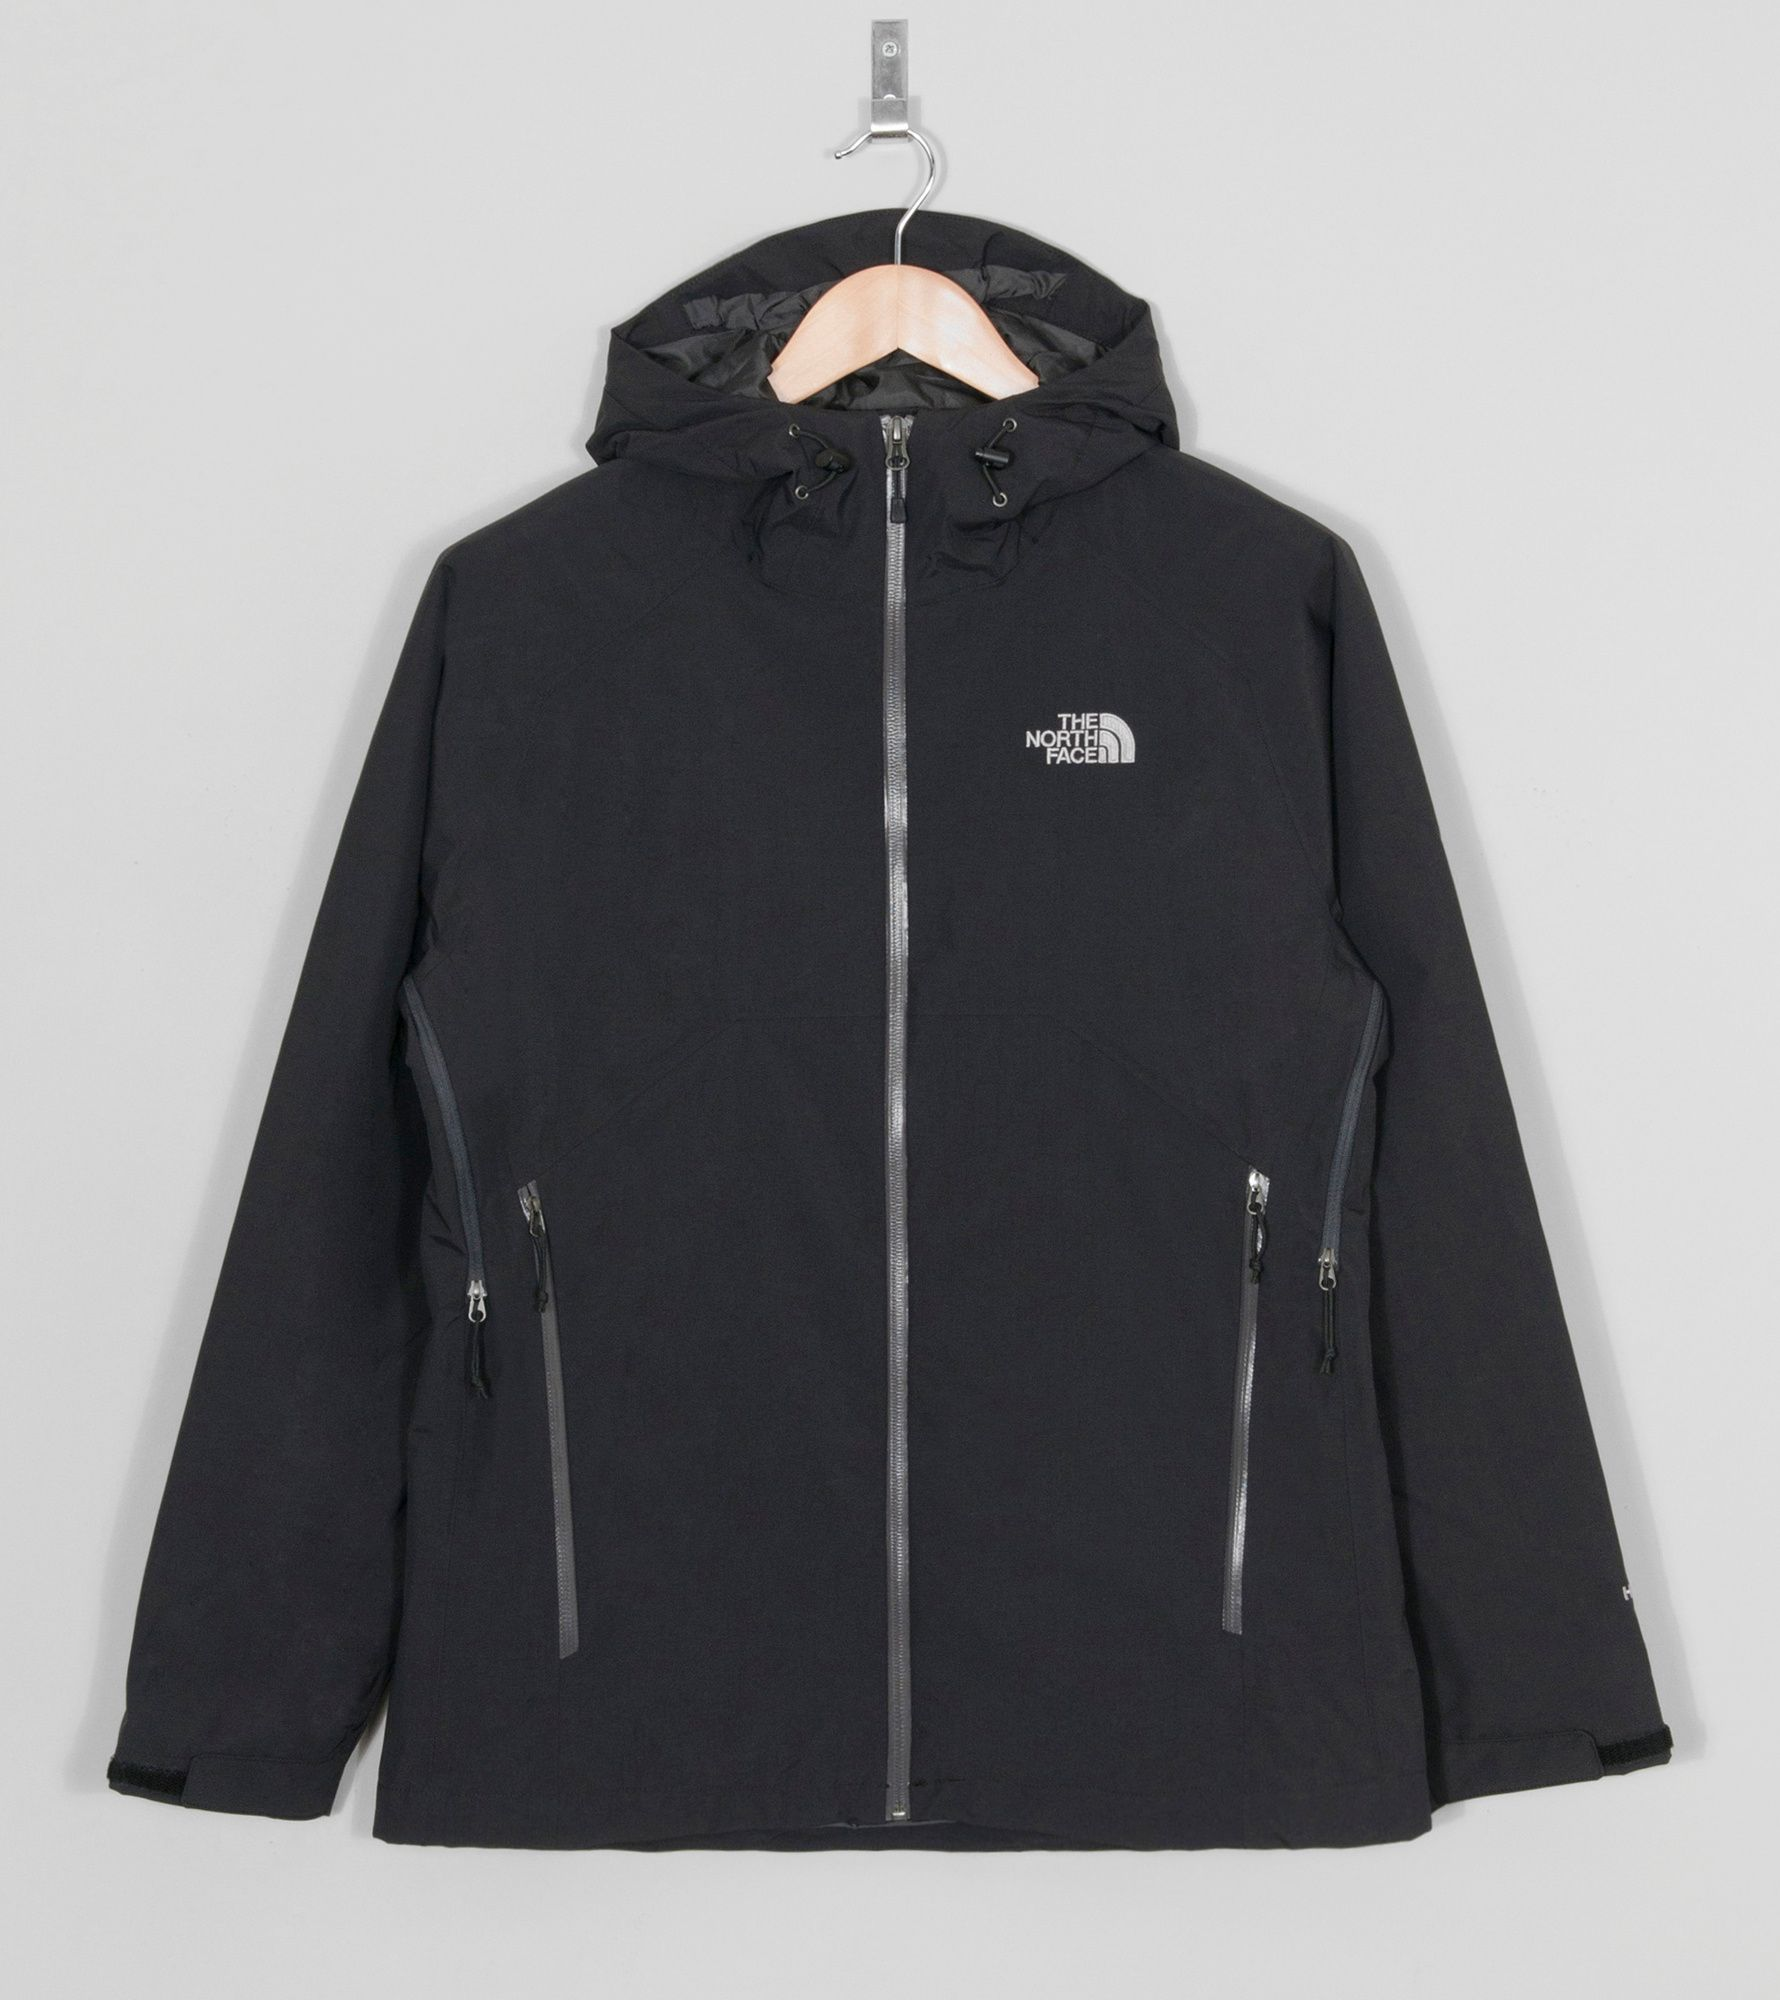 9890e9b6c919 50% off the north face stratos hyvent jacket jacket fbaf8 ac810